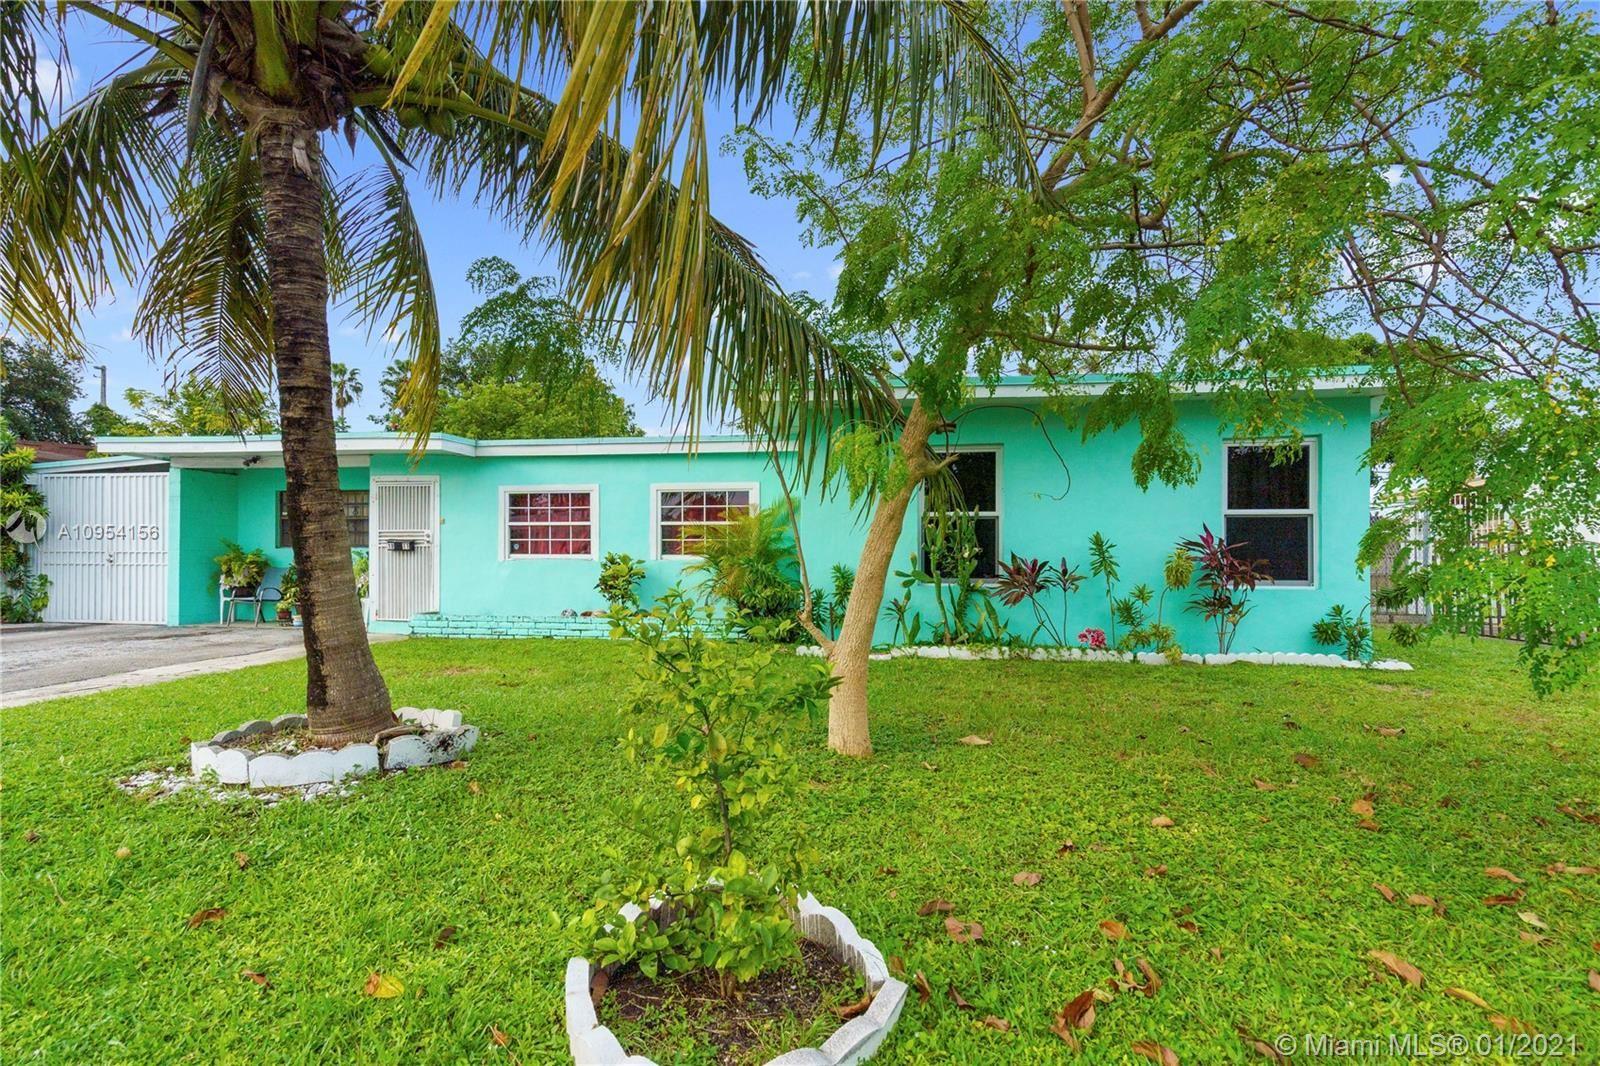 1811 NW 185th St, Miami Gardens, FL 33056 - #: A10954156